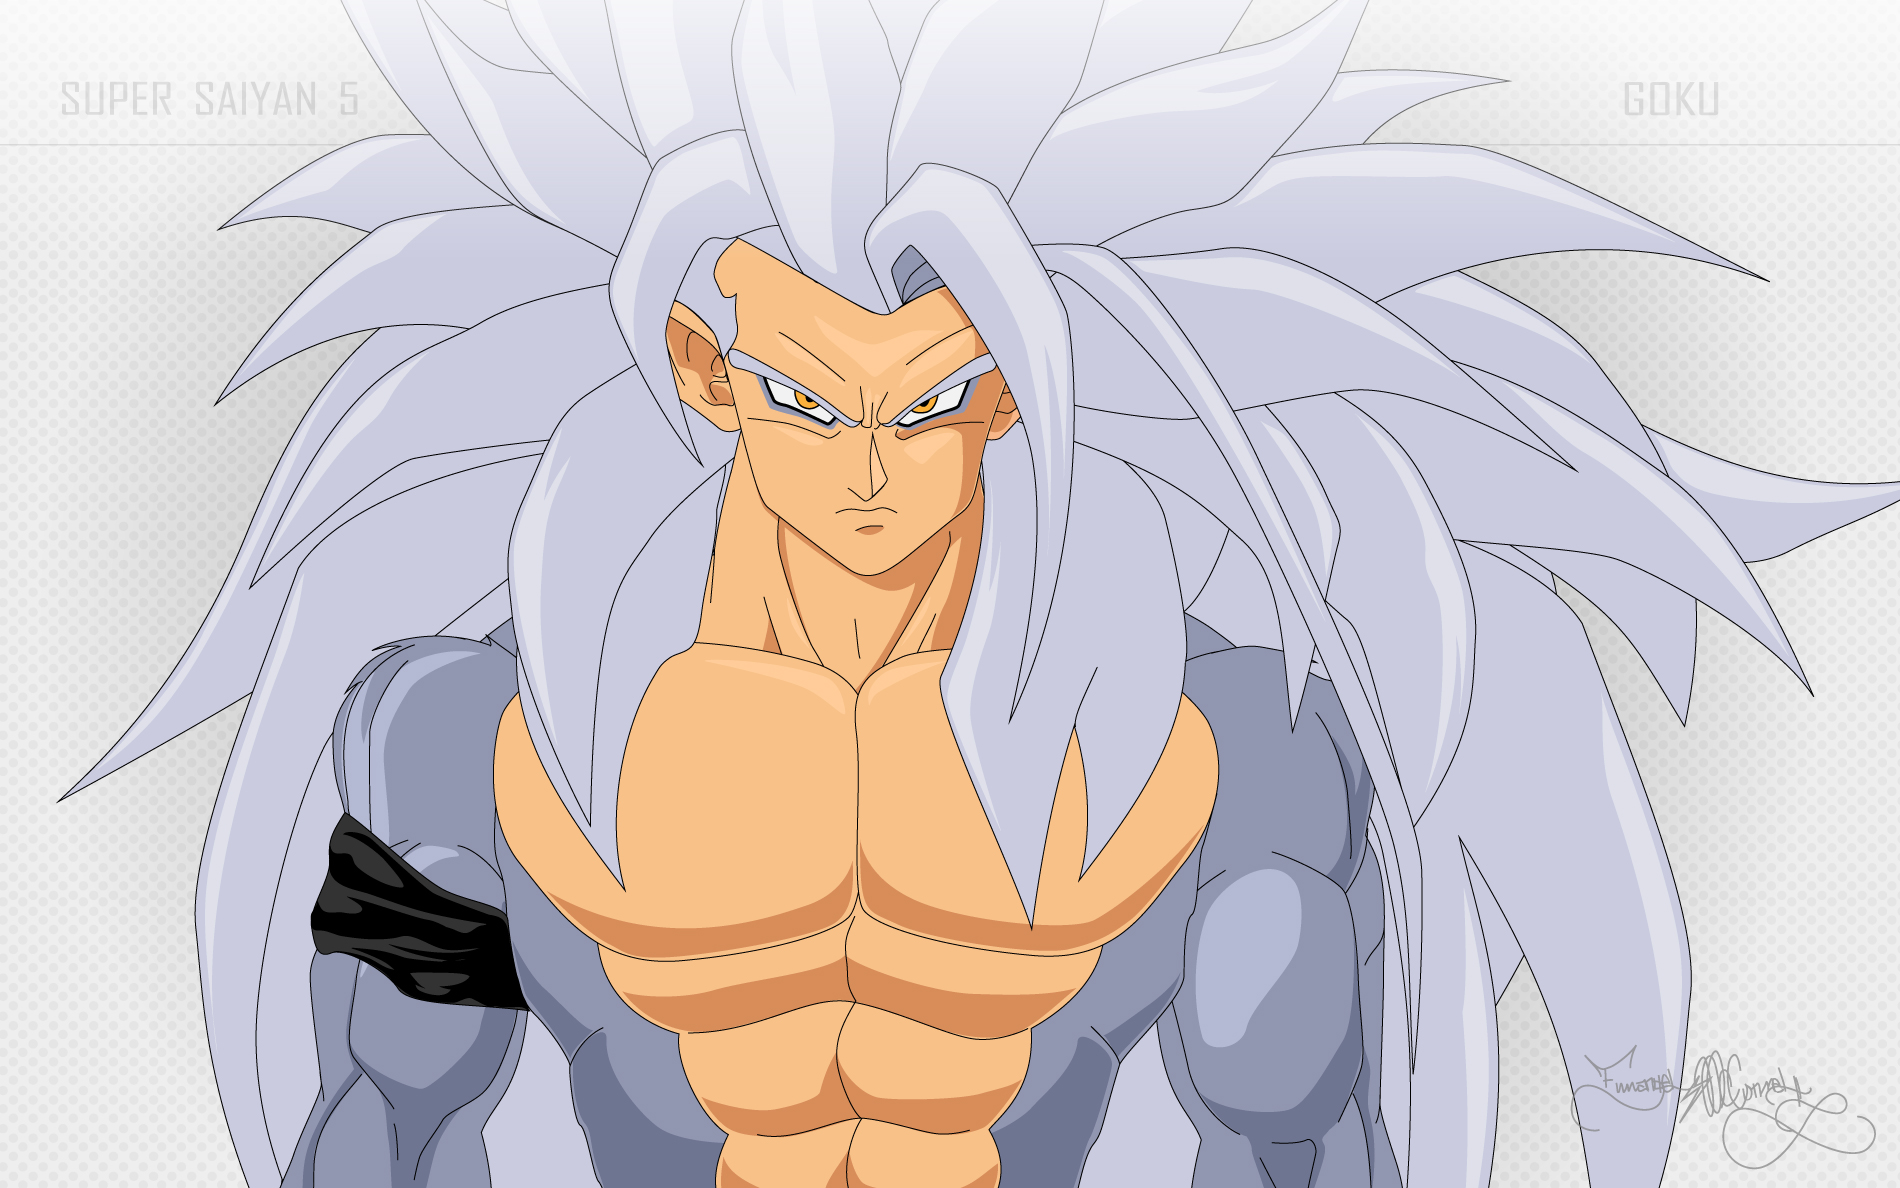 goku super saiyan 5: